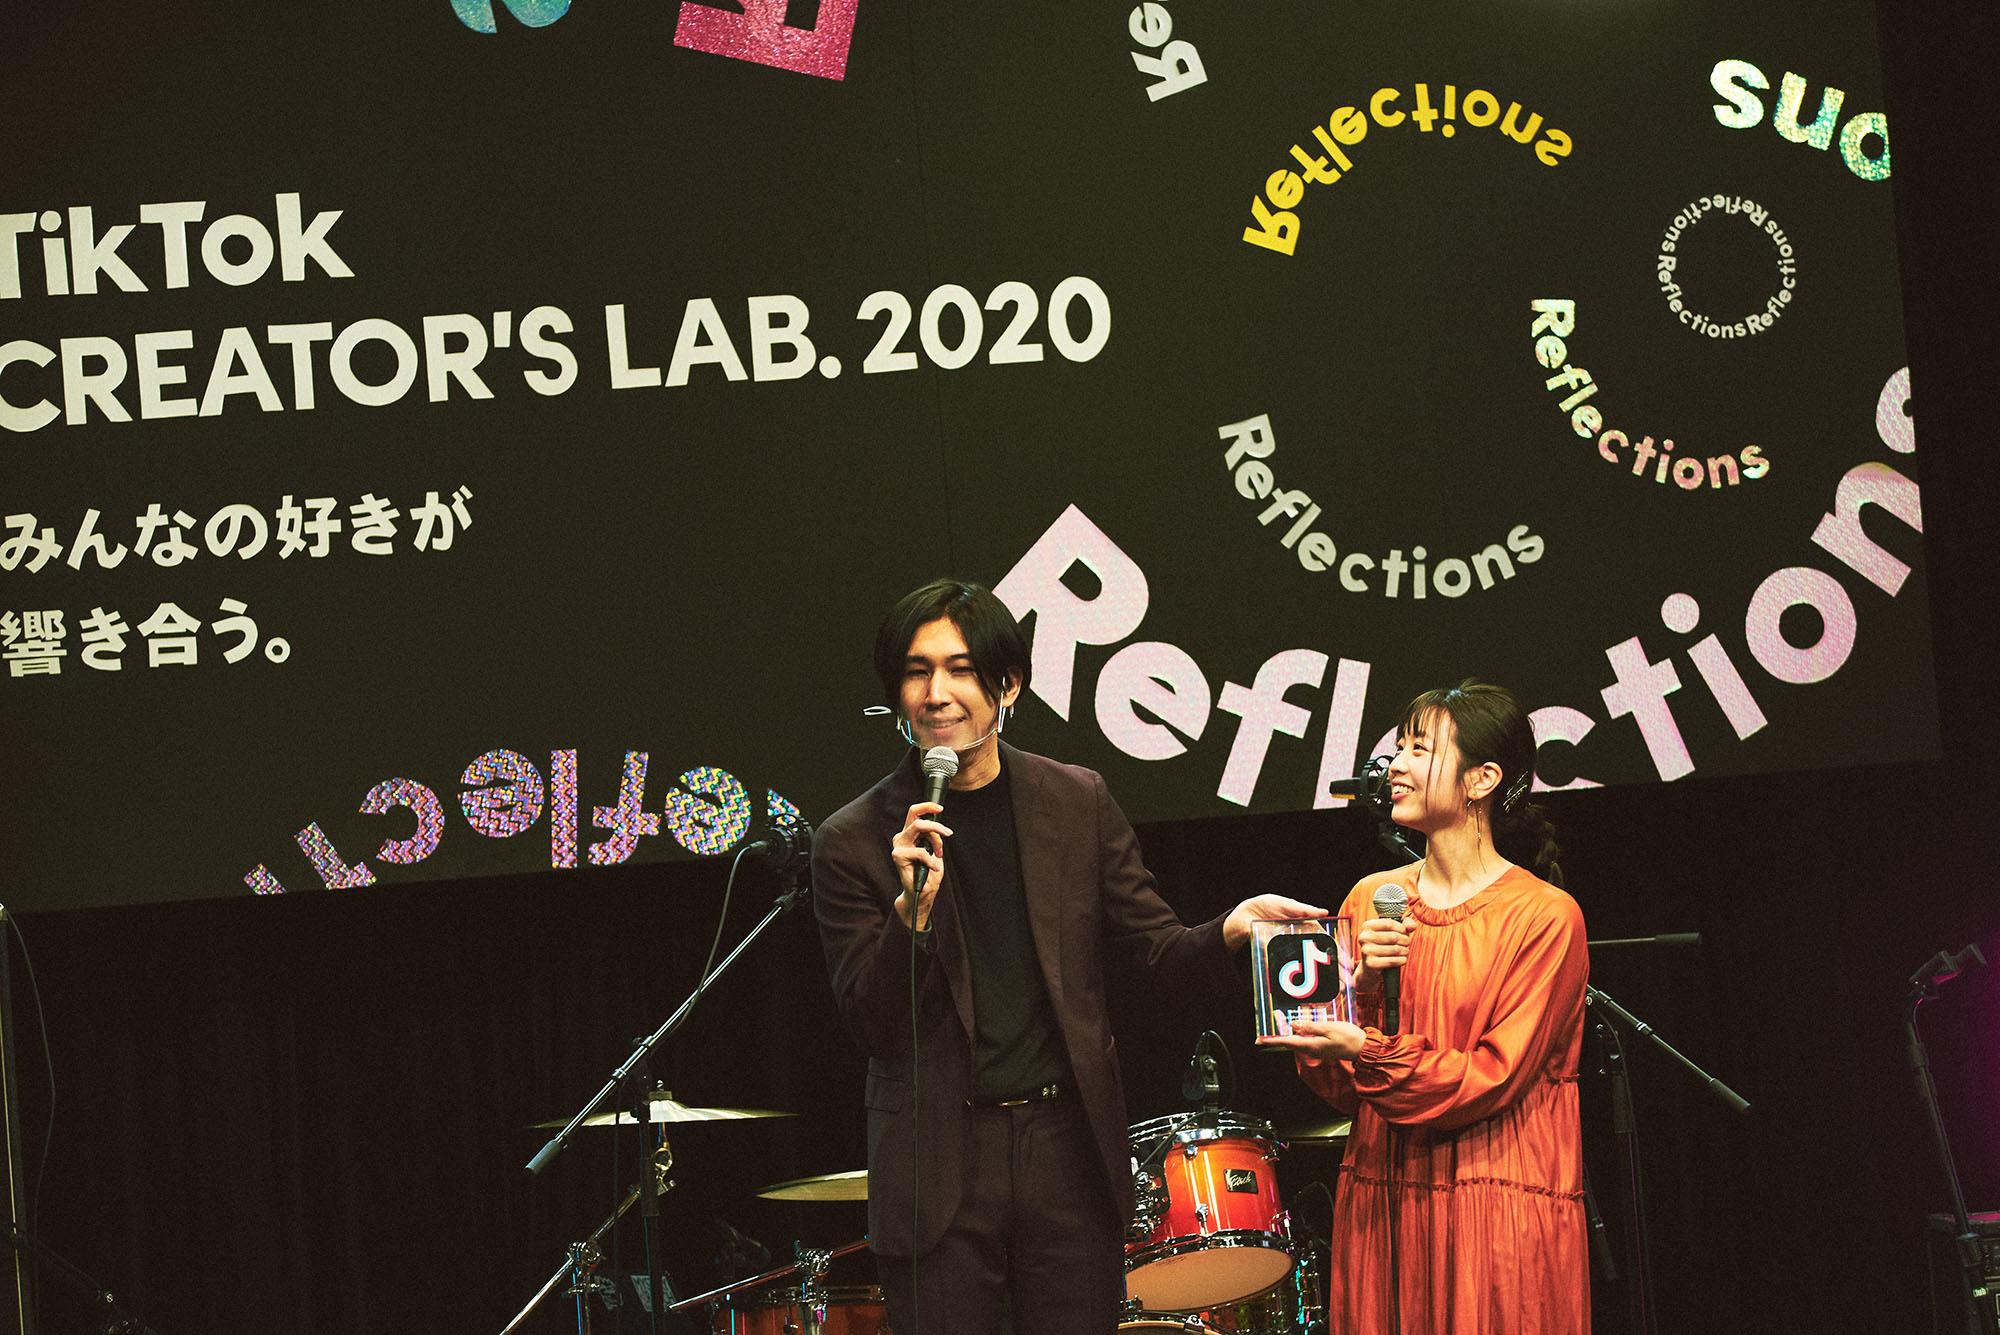 evening cinema原田夏樹、cinnamons鈴木まりこ。ミュージック部門賞「#君の虜に」/PHOTO:YURIE PEPE